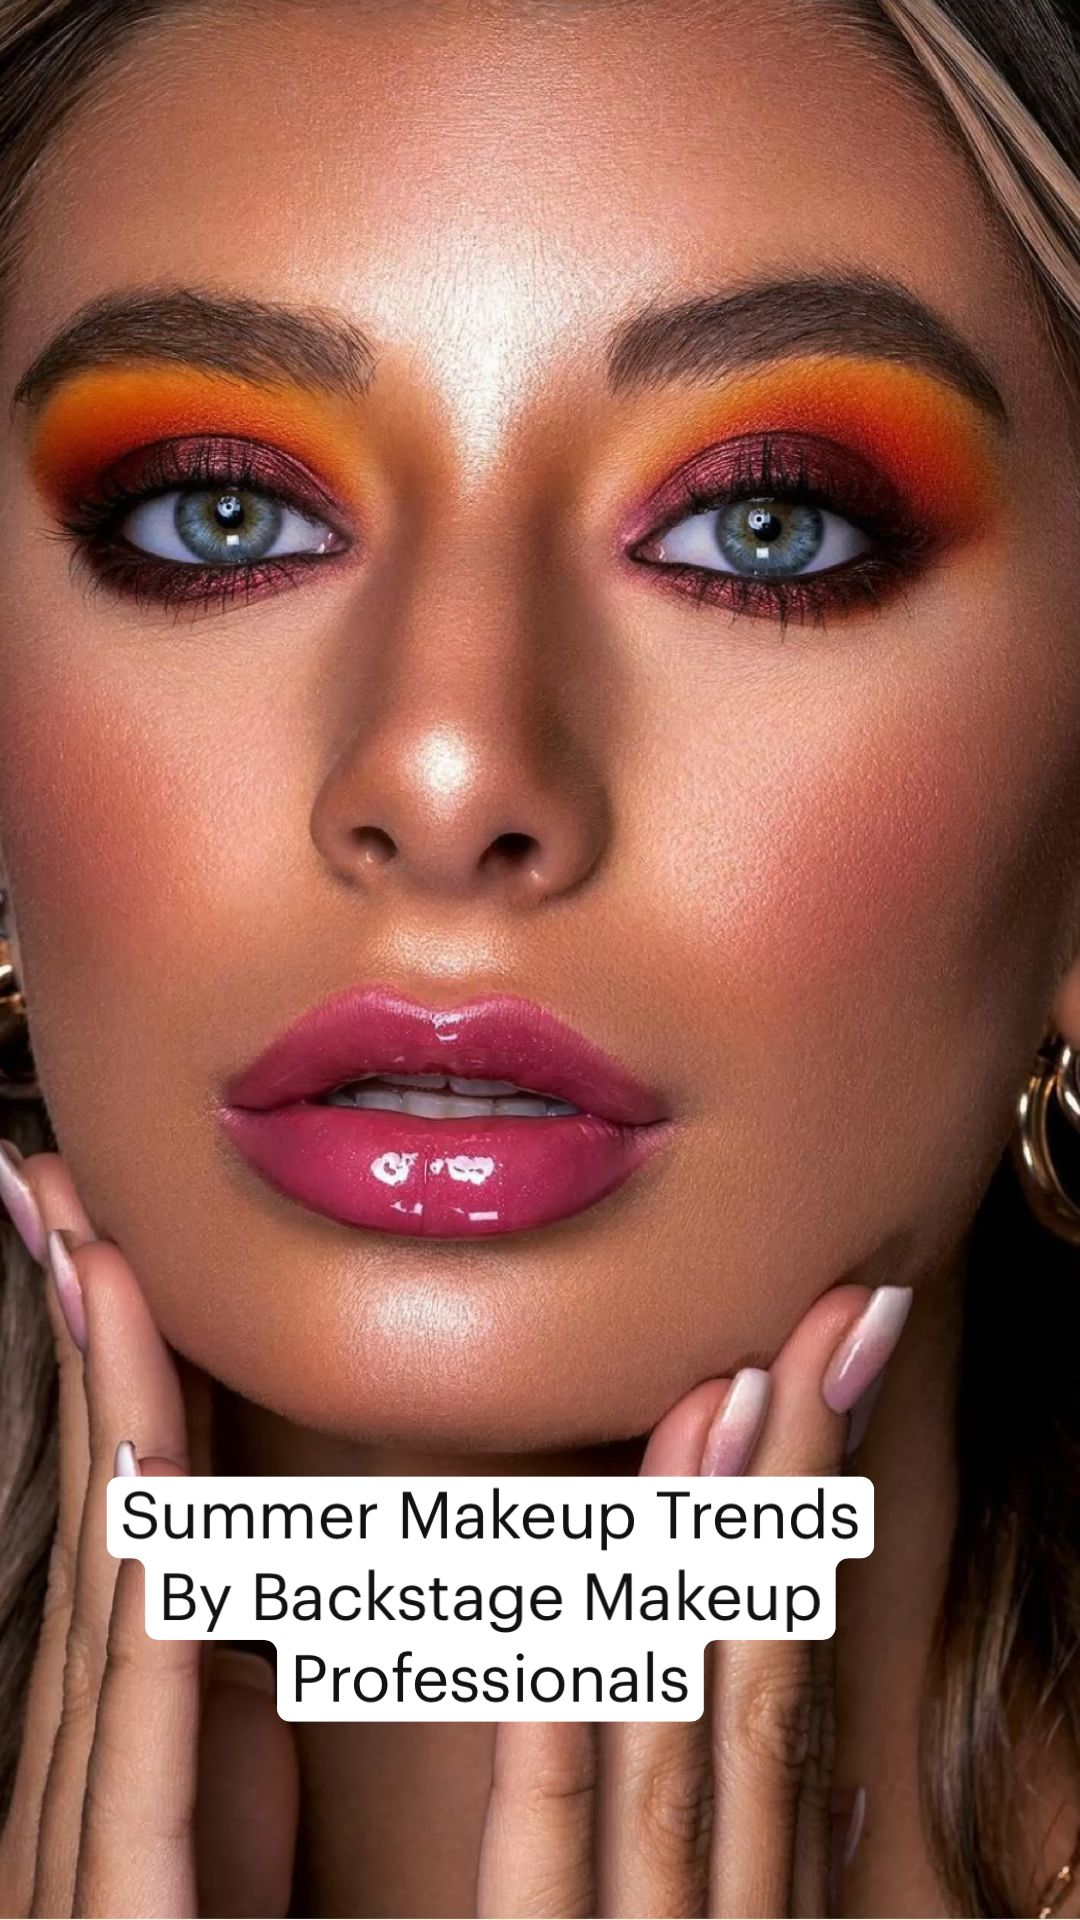 Summer Makeup Trends By Backstage Makeup Professionals